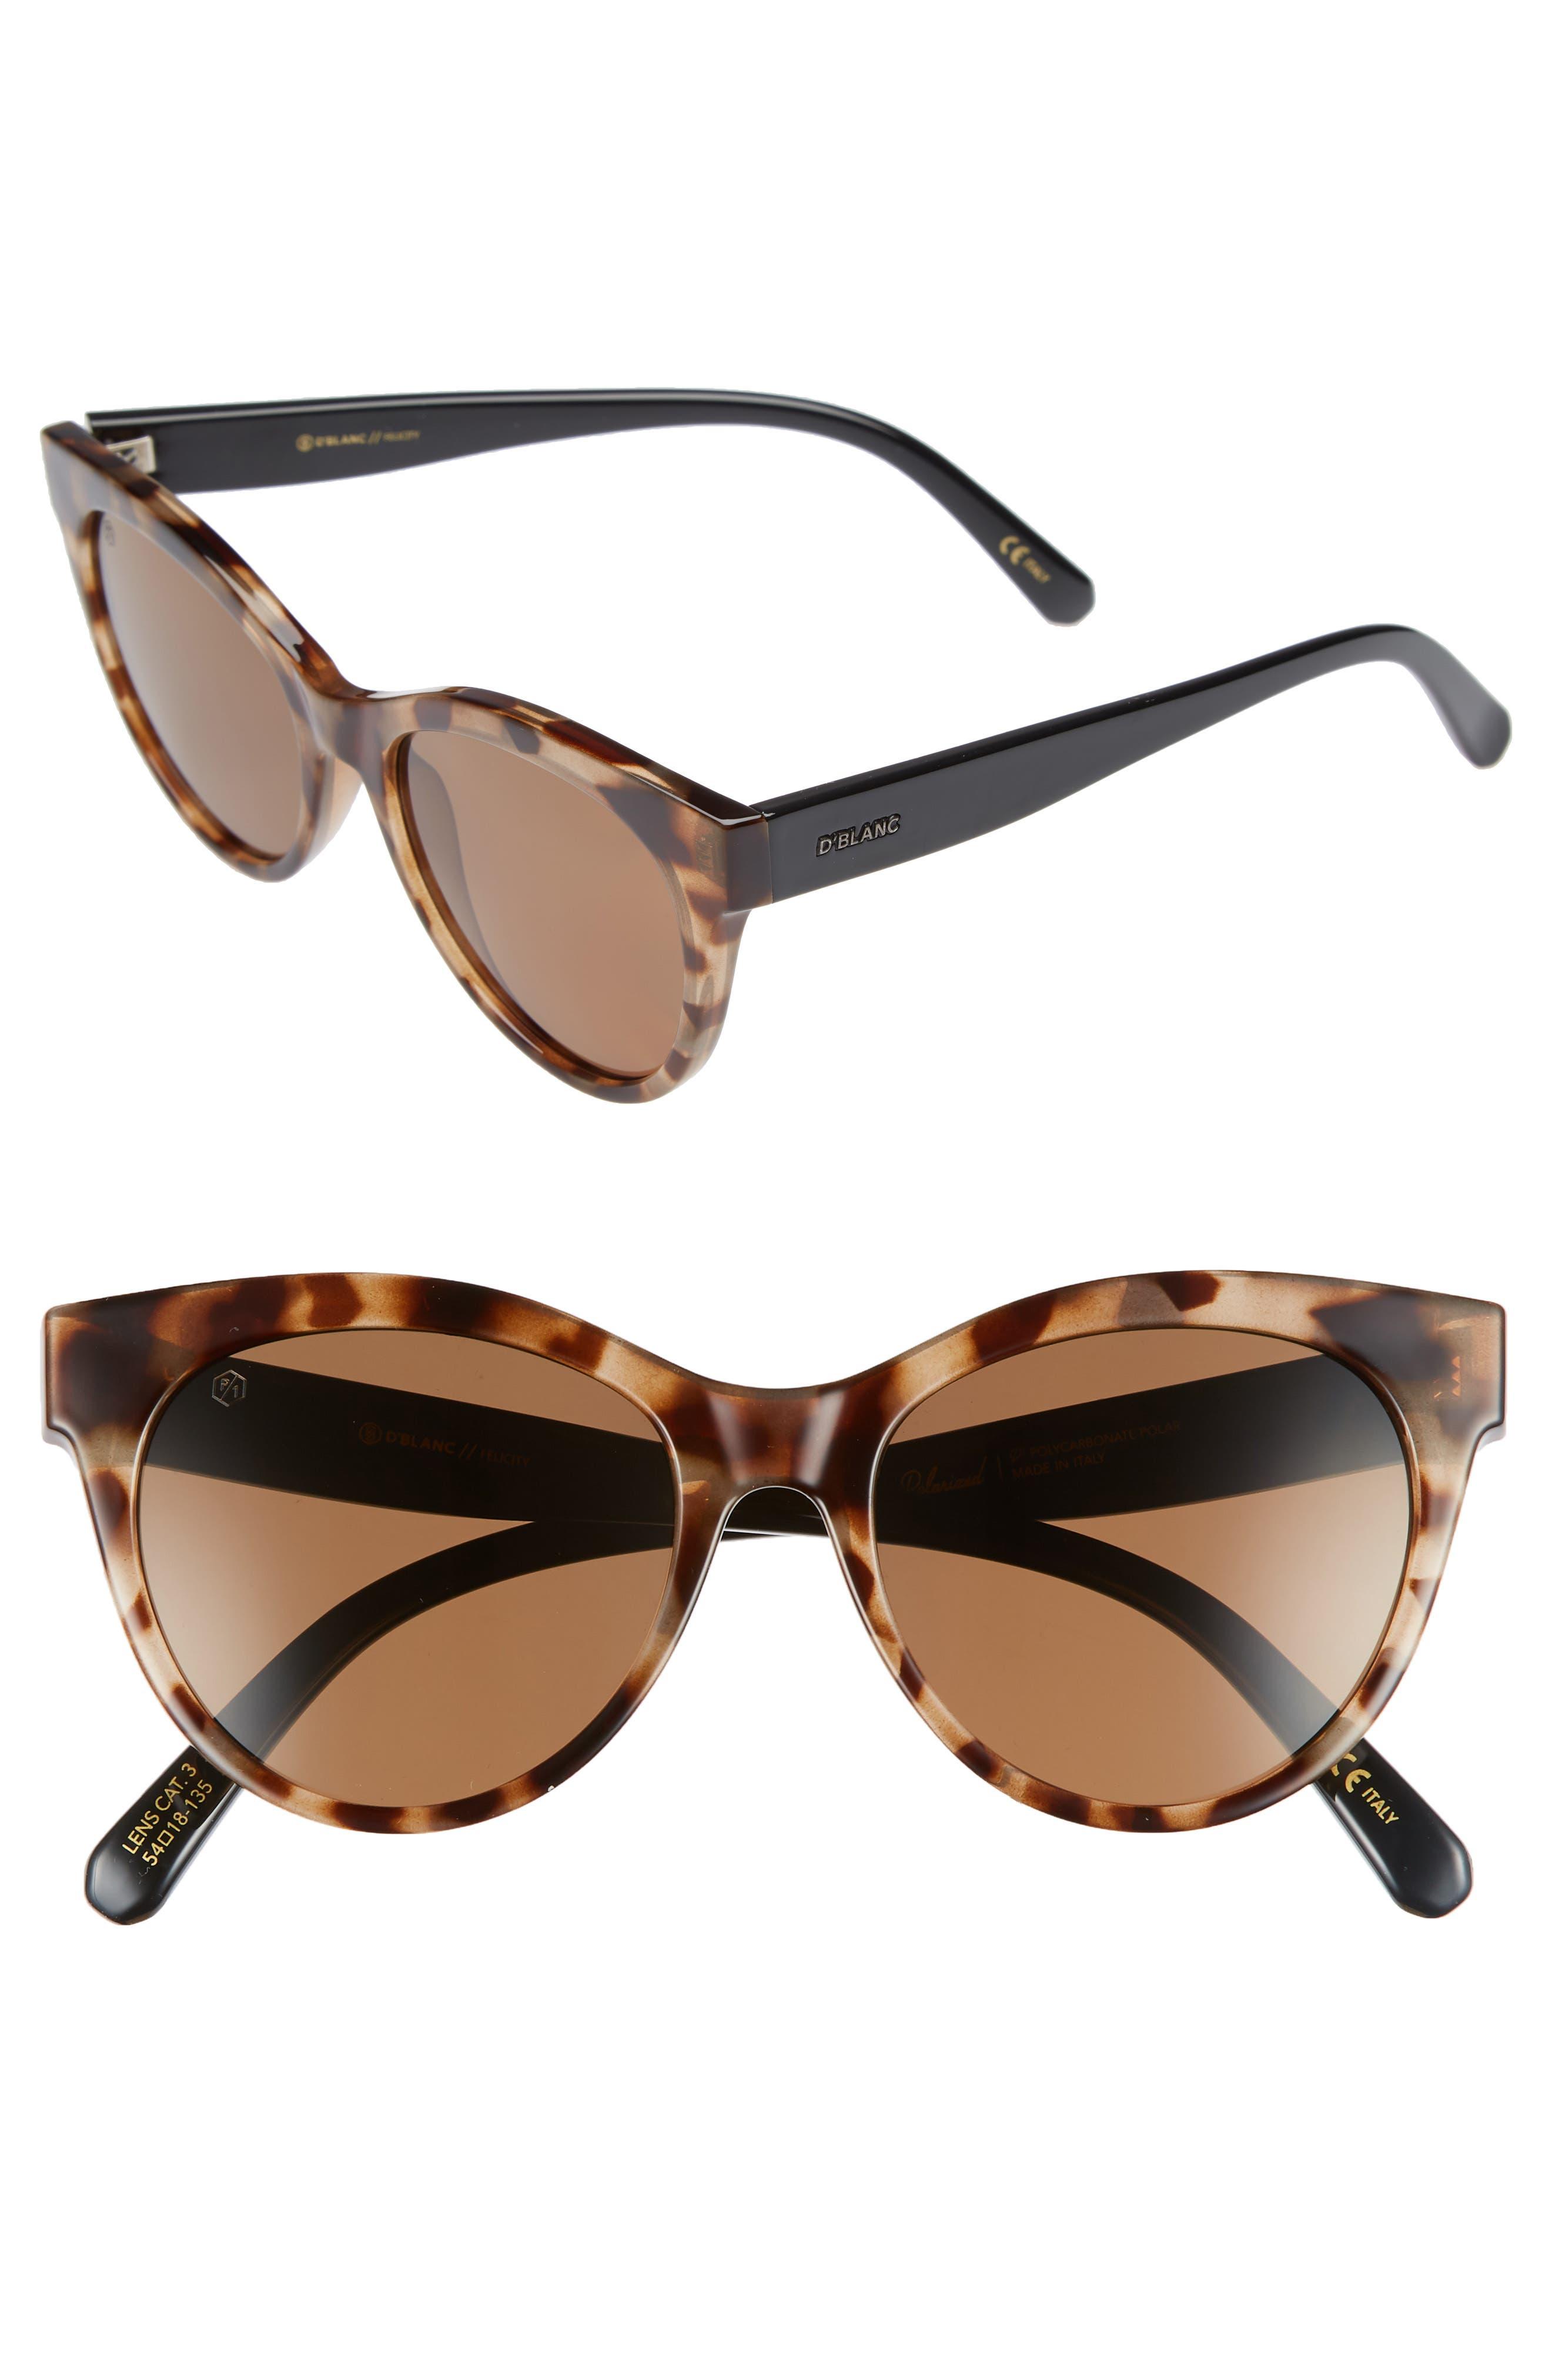 D'BLANC Felicity 54mm Polarized Sunglasses,                             Main thumbnail 1, color,                             200